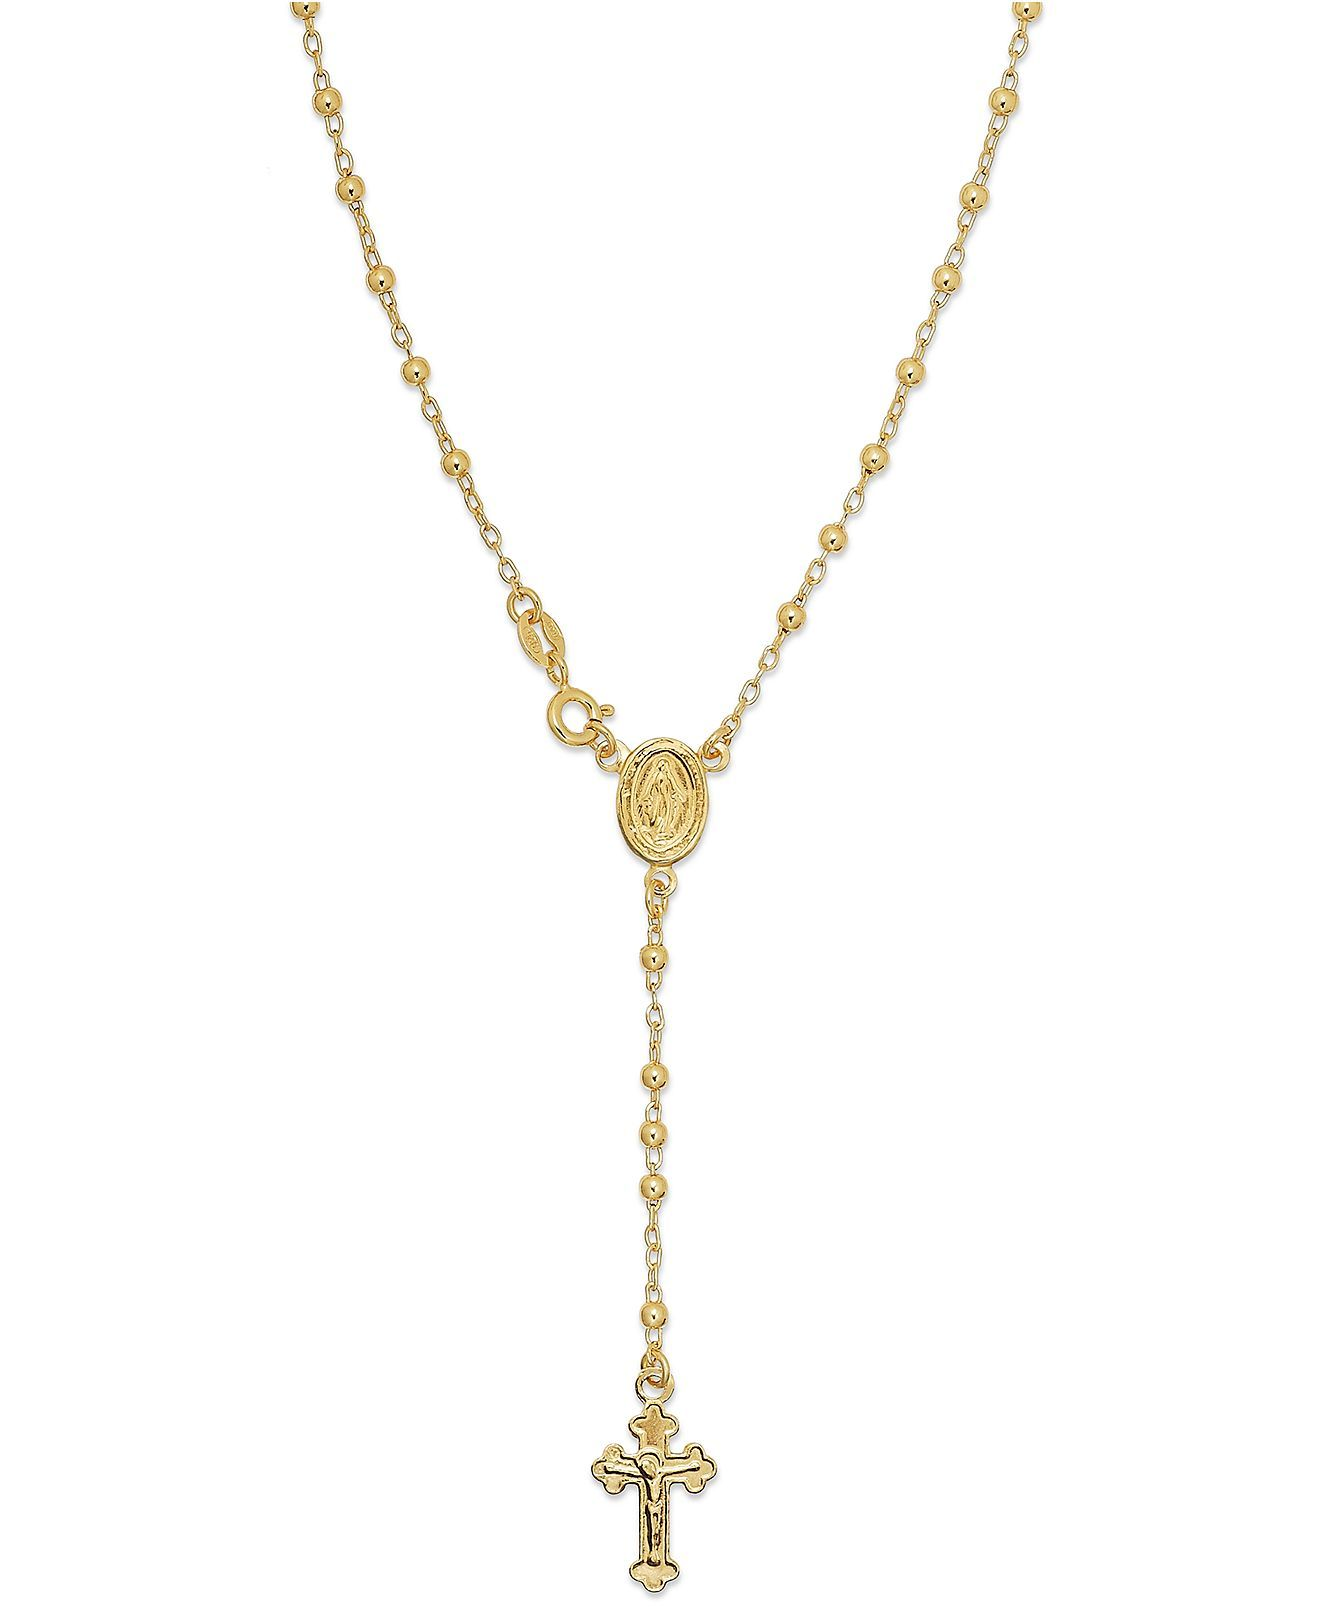 giani bernini 24k gold sterling silver necklace